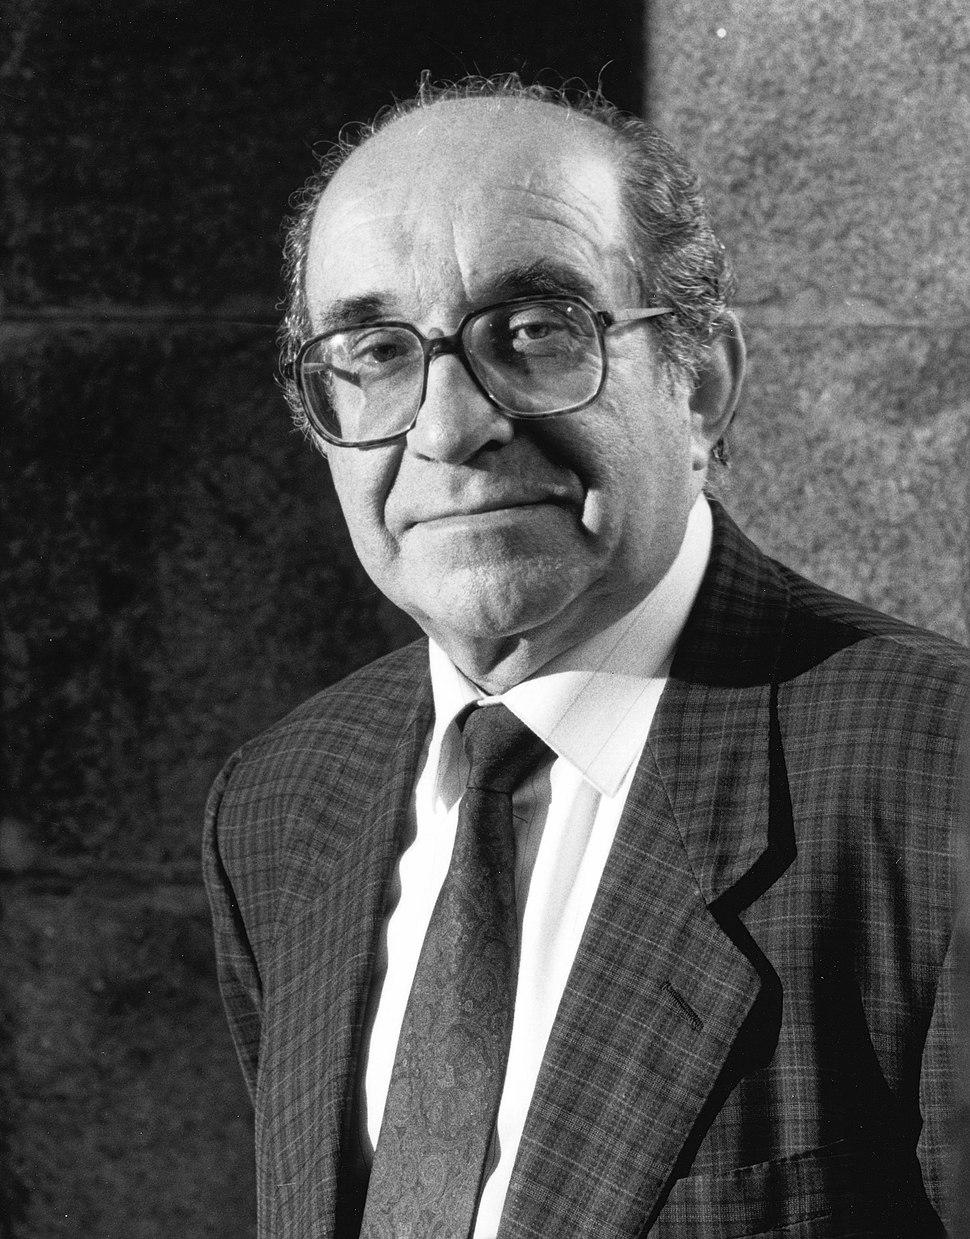 Luciano García Alén